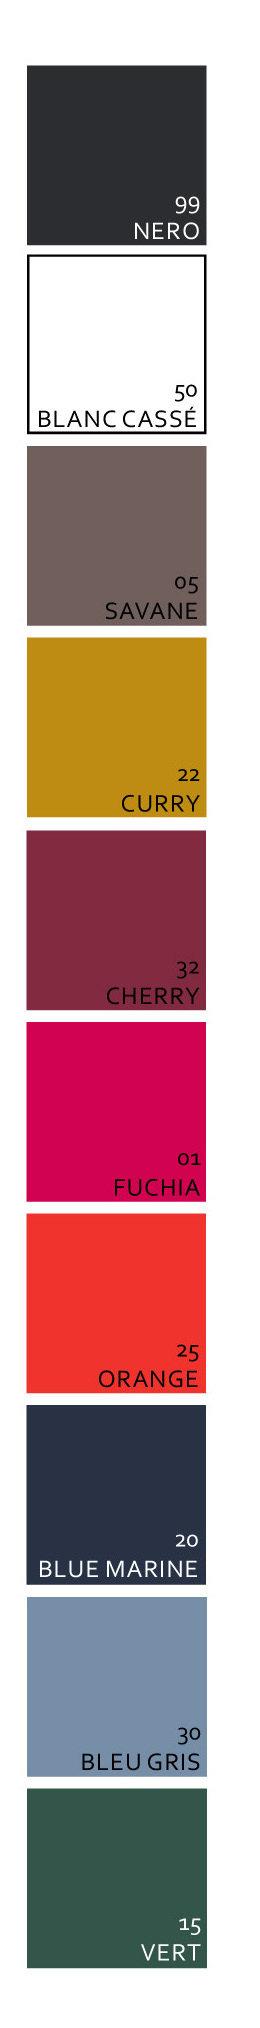 Maloka: Asymmetrical Free Flow Long Tunic (More colors!)